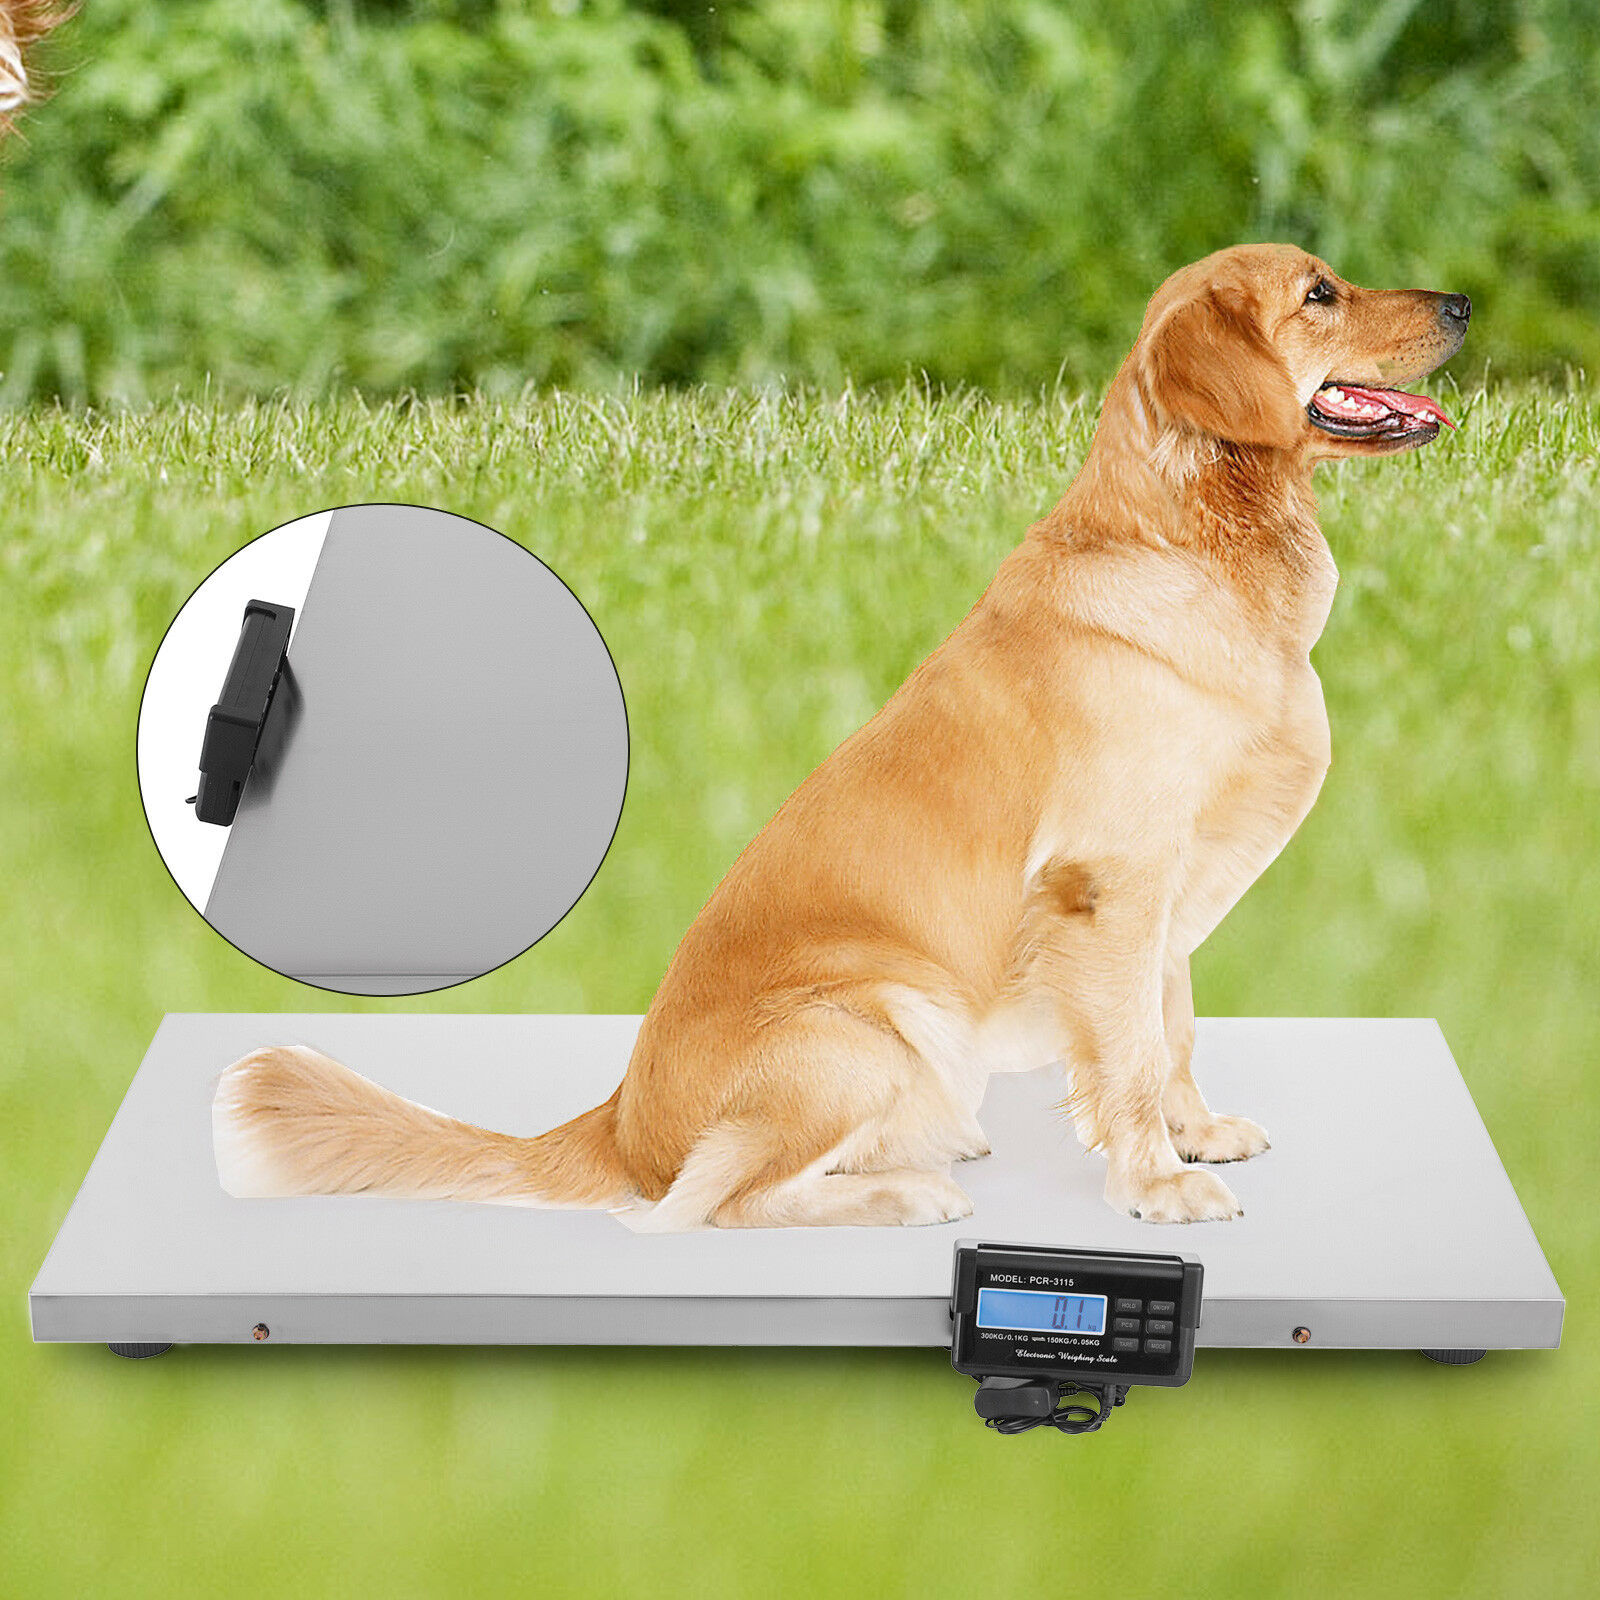 660LB Digital Livestock Vet Scale Hog Pet Dog Sheep Heavy Duty Weight